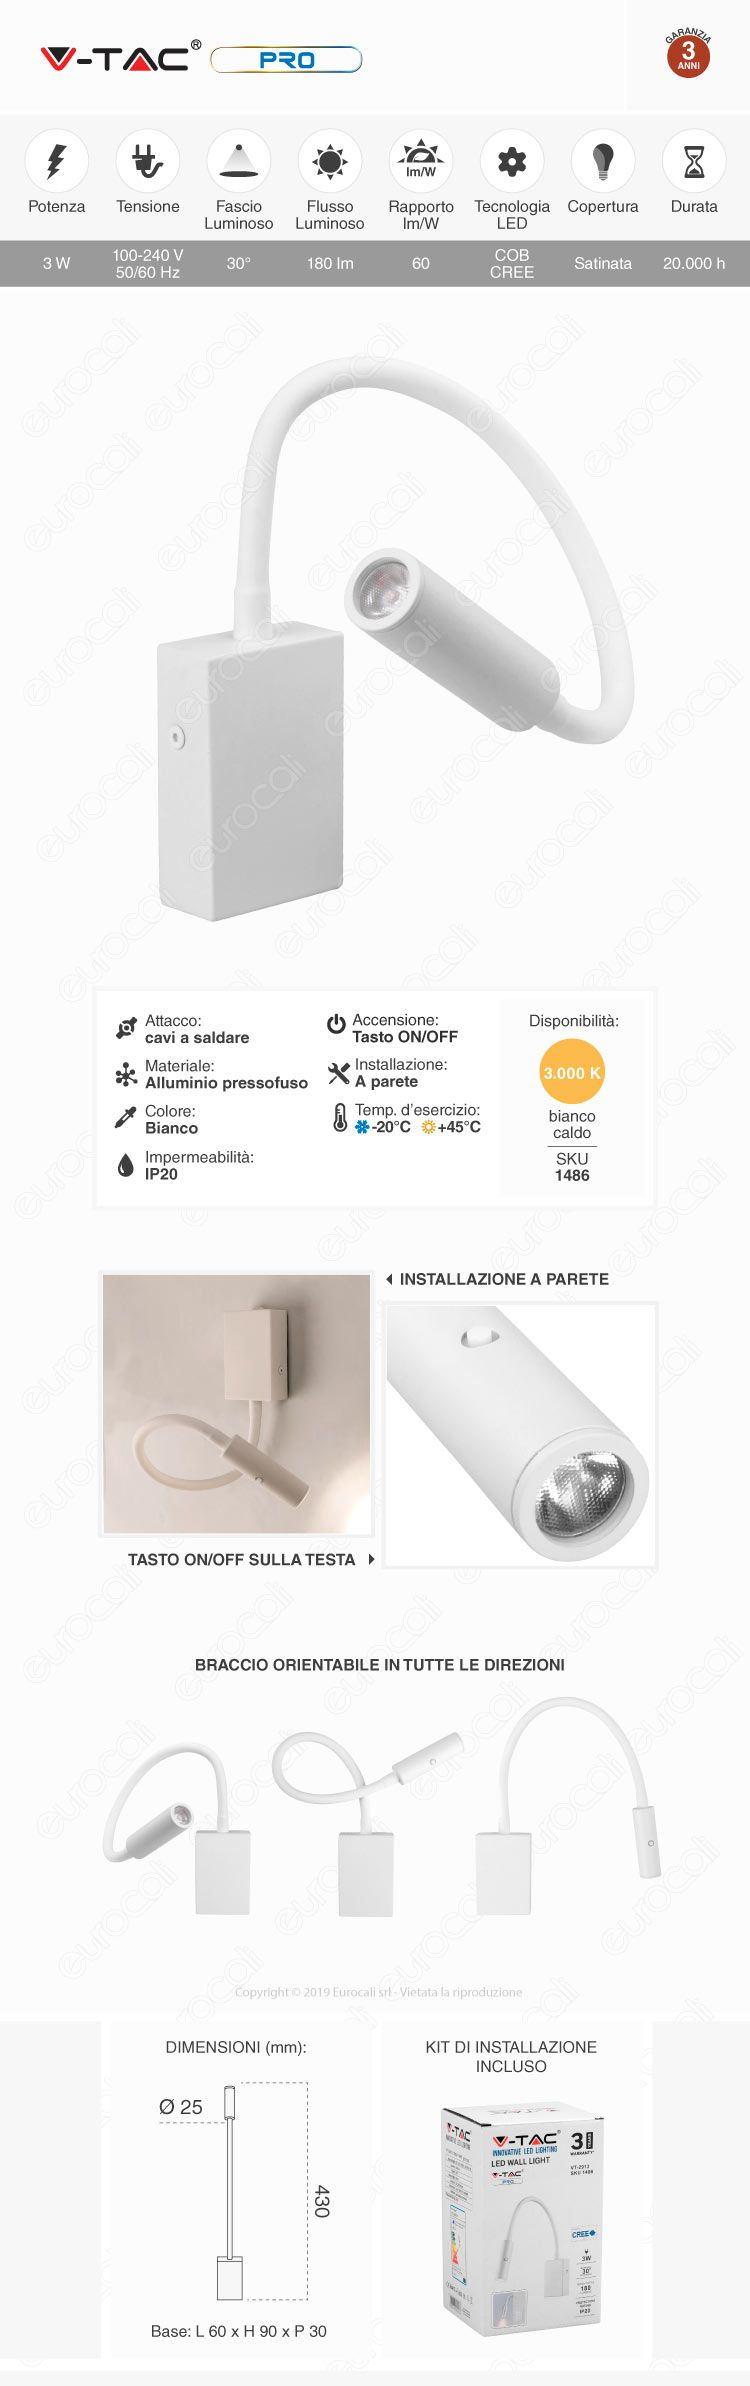 V-Tac PRO VT-2913 Lampada da Muro Wall Light LED CREE 3W Colore Bianco